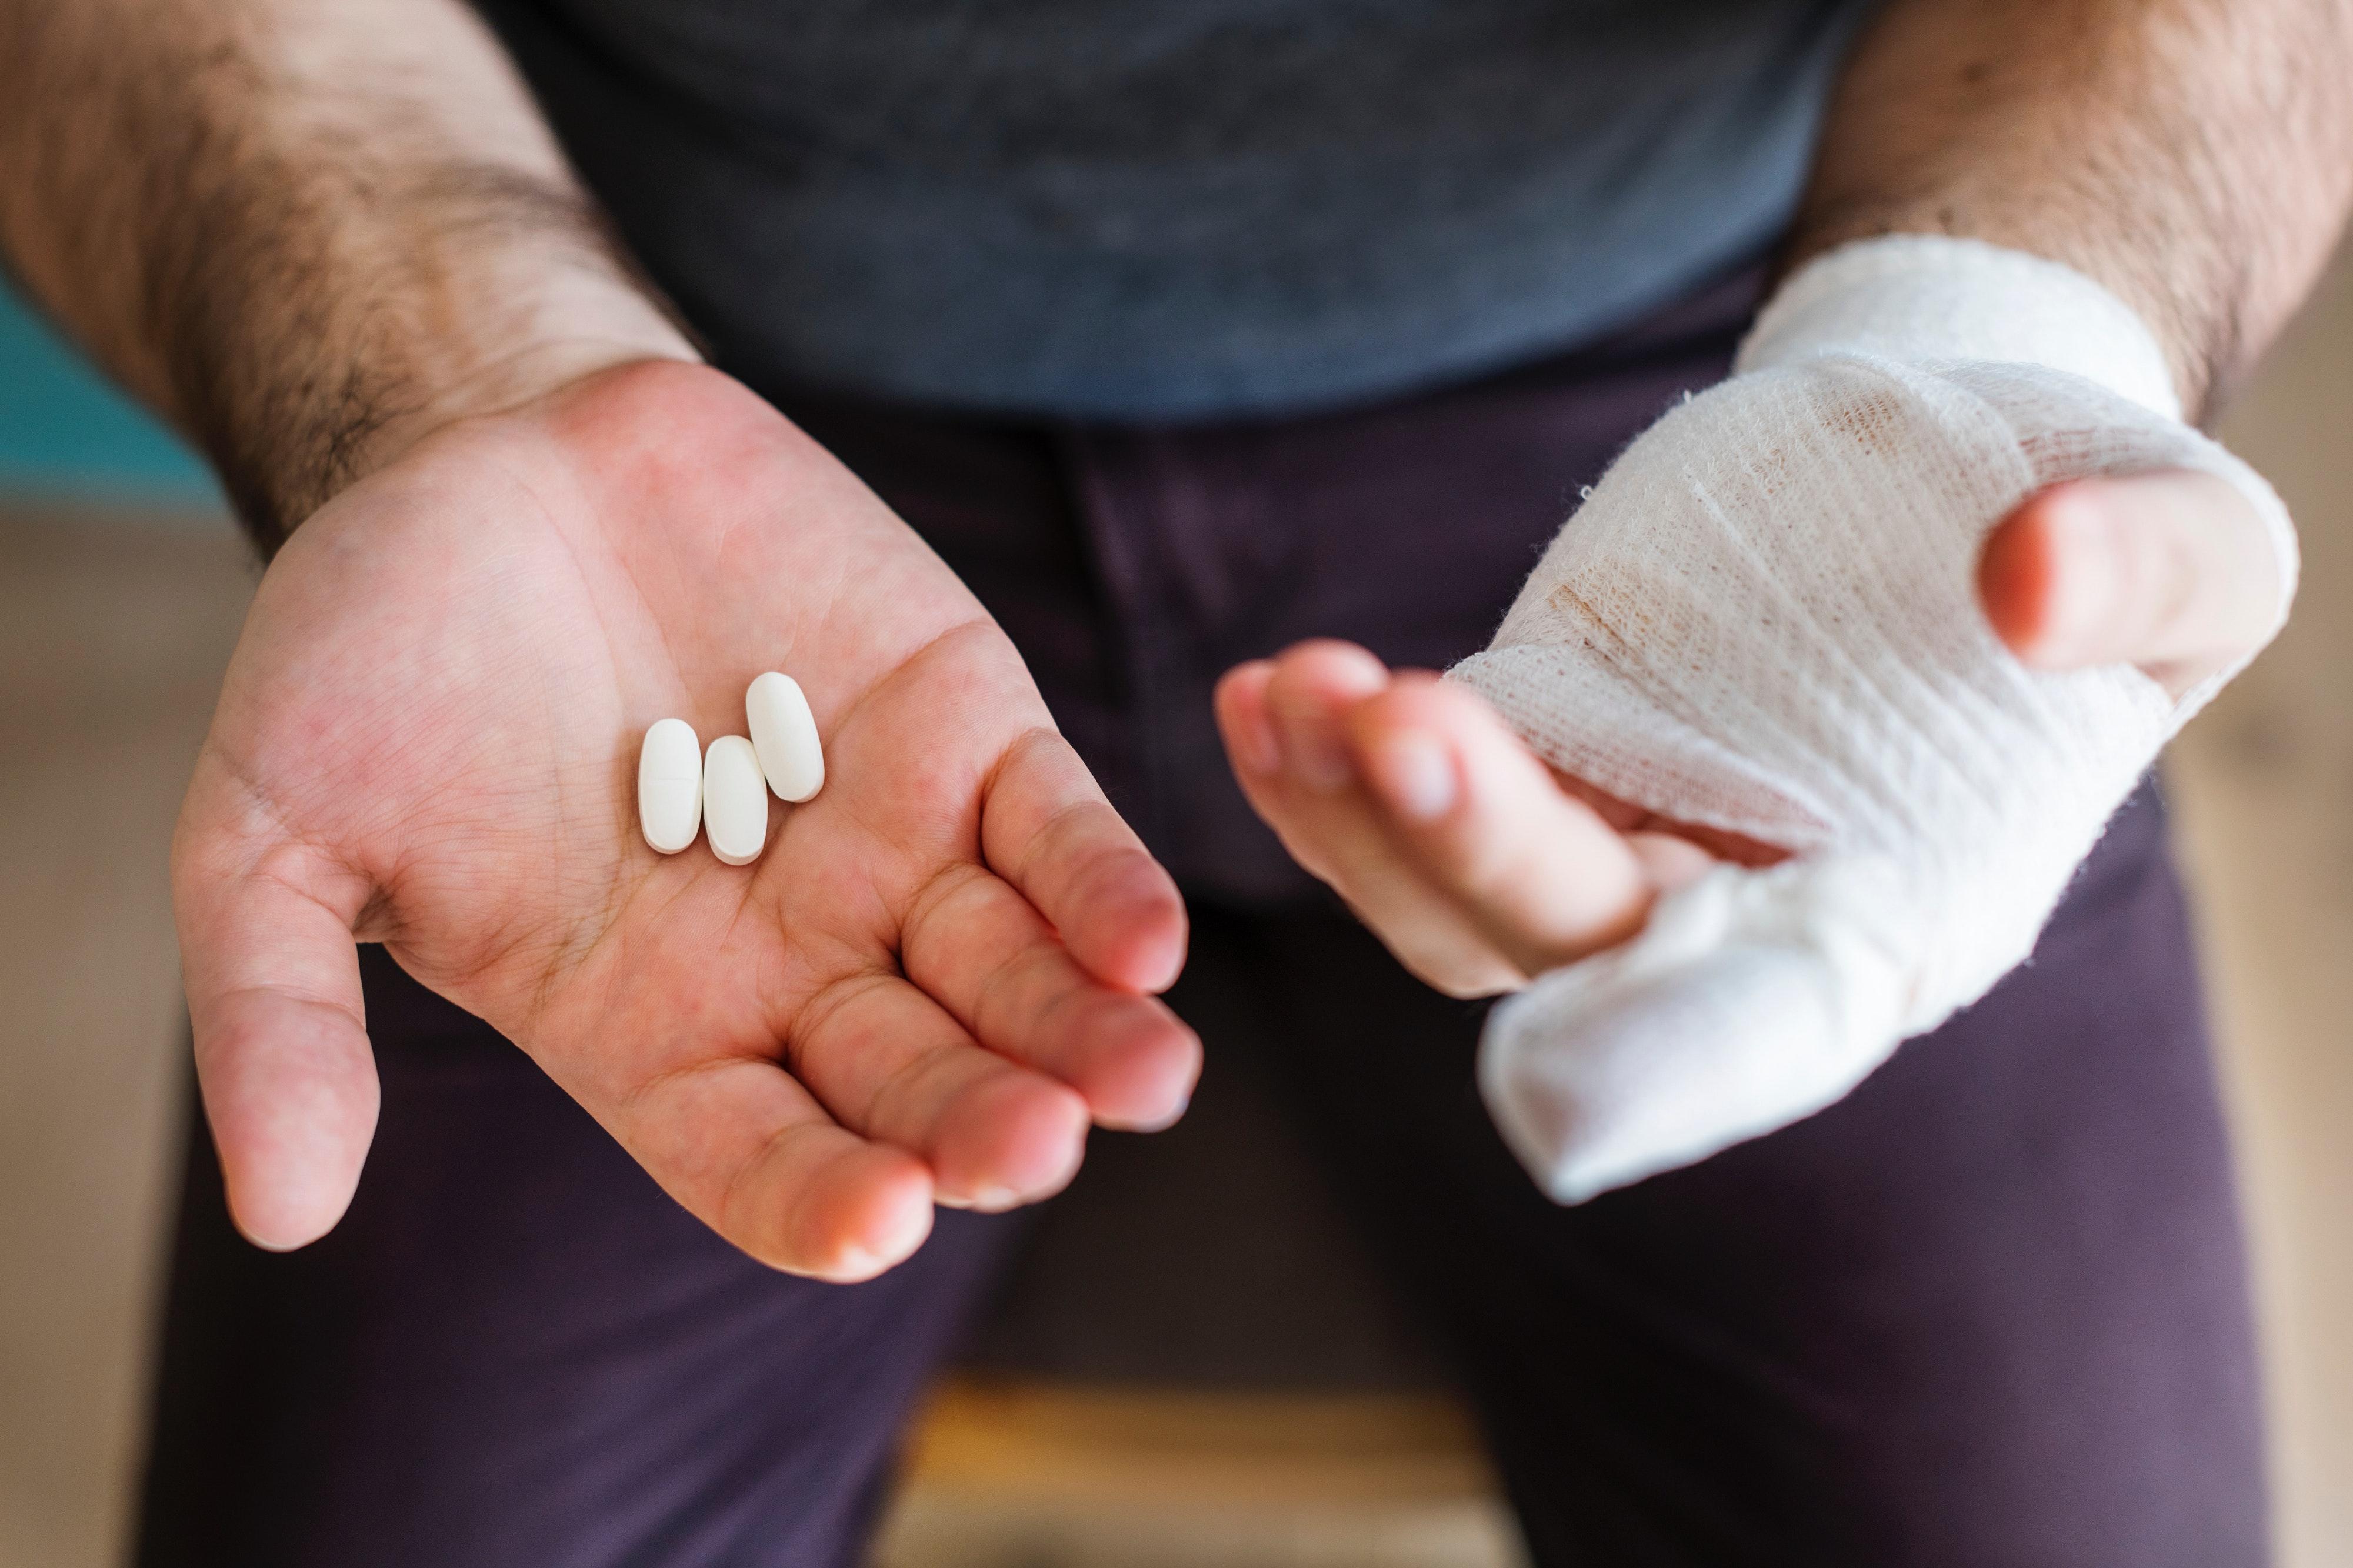 From: https://images.pexels.com/photos/1371172/pexels-photo-1371172.jpeg?cs=srgb&dl=bandage-close-up-drugs-1371172.jpg&fm=jpg, https://www.pexels.com/photo/man-holding-three-white-medication-pills-1371172/